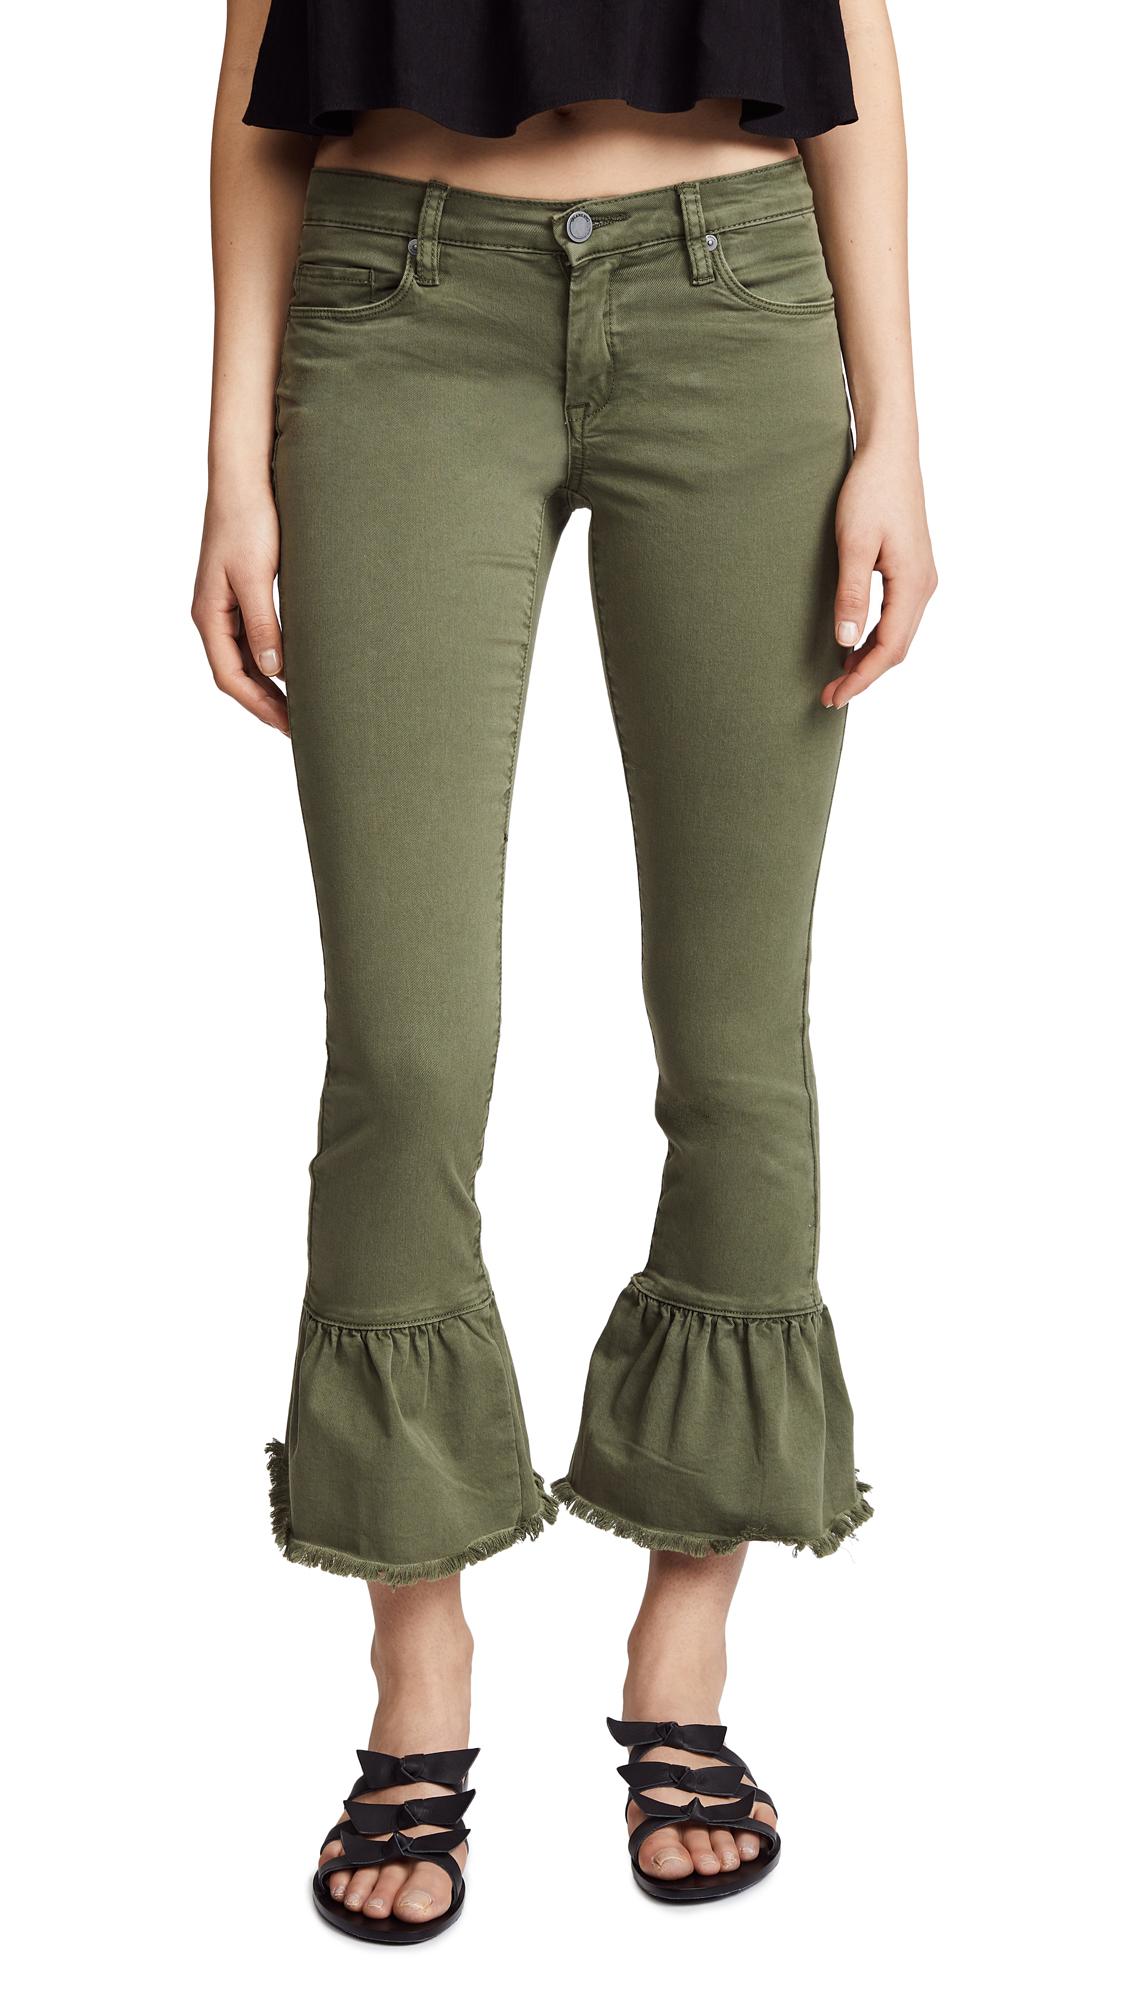 Blank Denim Skinny Jeans with Ruffle Hem